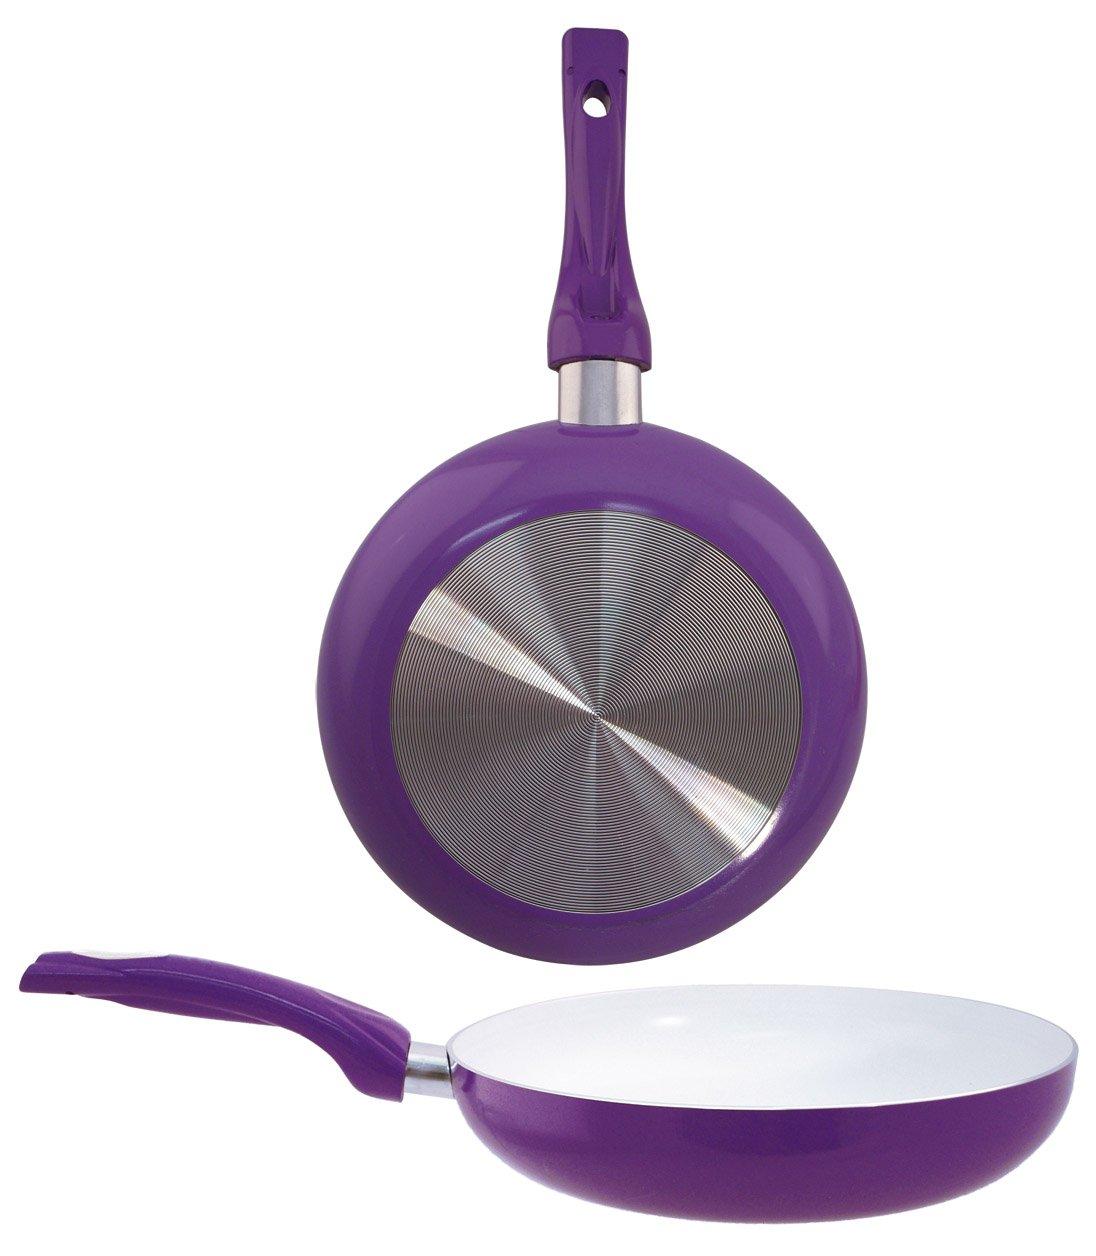 EURO-HOME Ceramic Coated Fry Pan, 8'', Purple